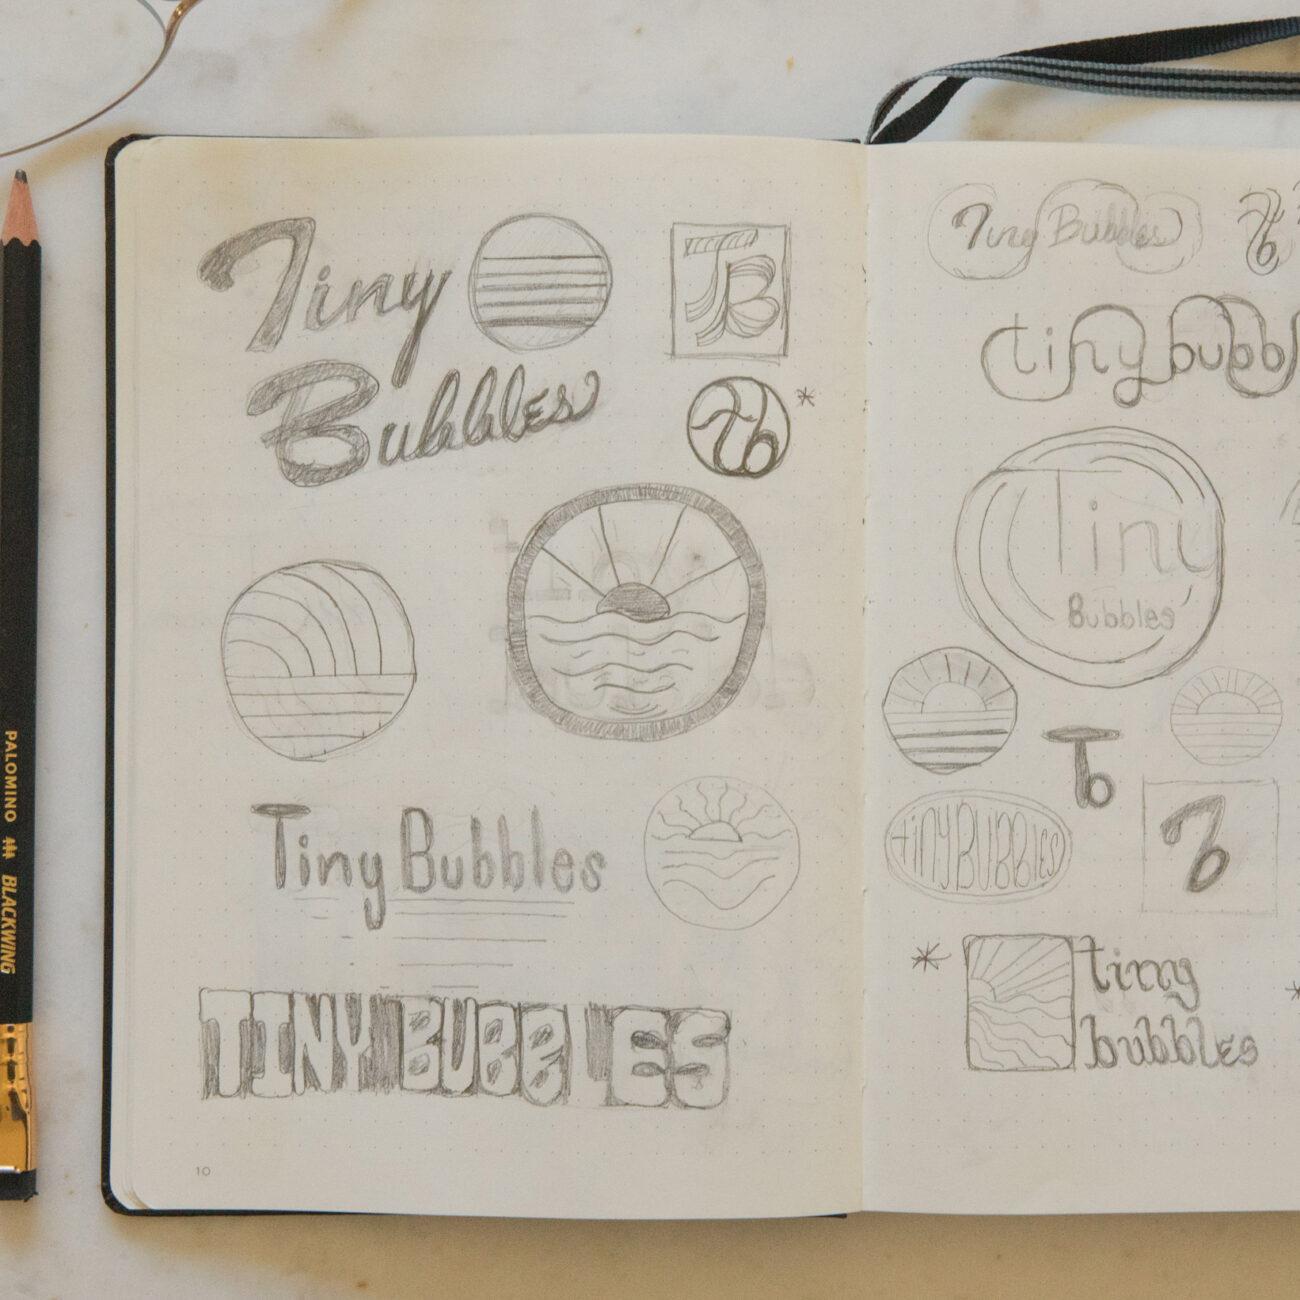 Tiny Bubbles Brand Identity Design Sketches